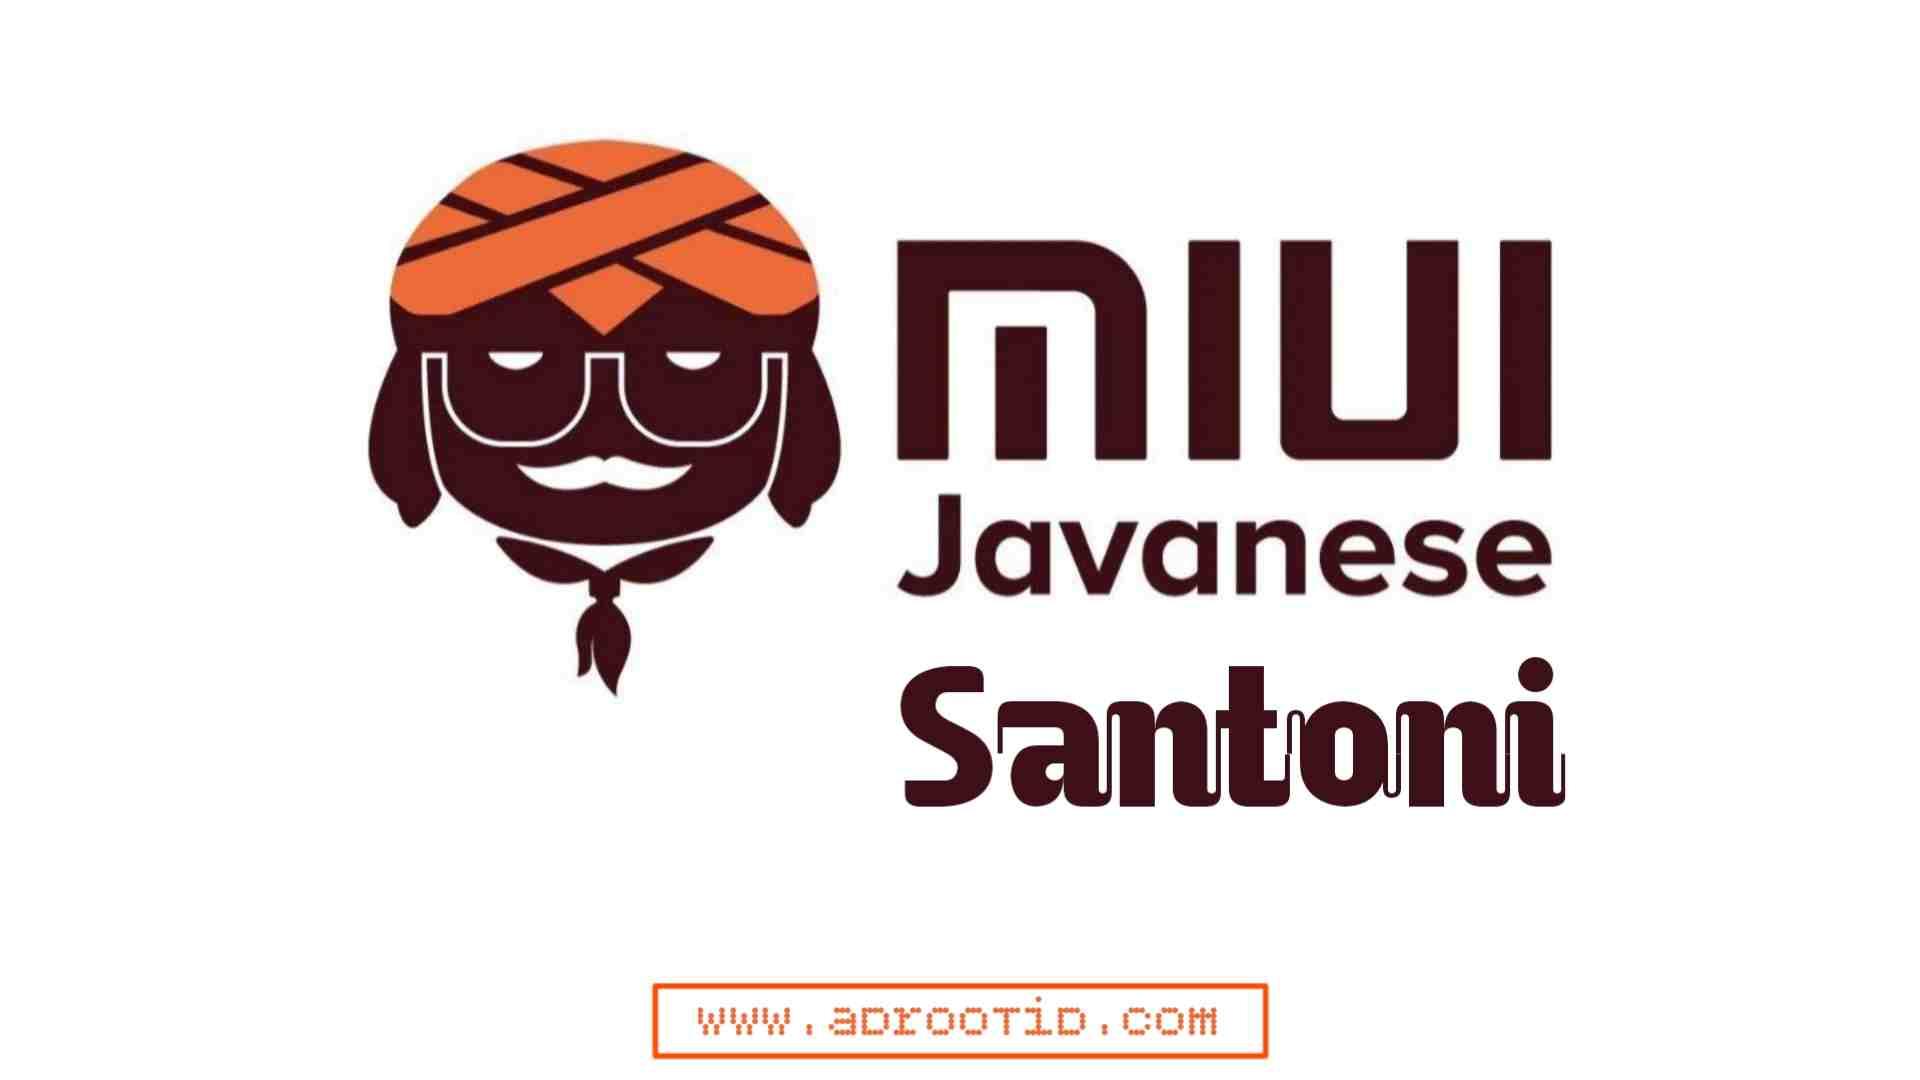 MIUI 12.1 Javanese for Redmi 4X | Santoni